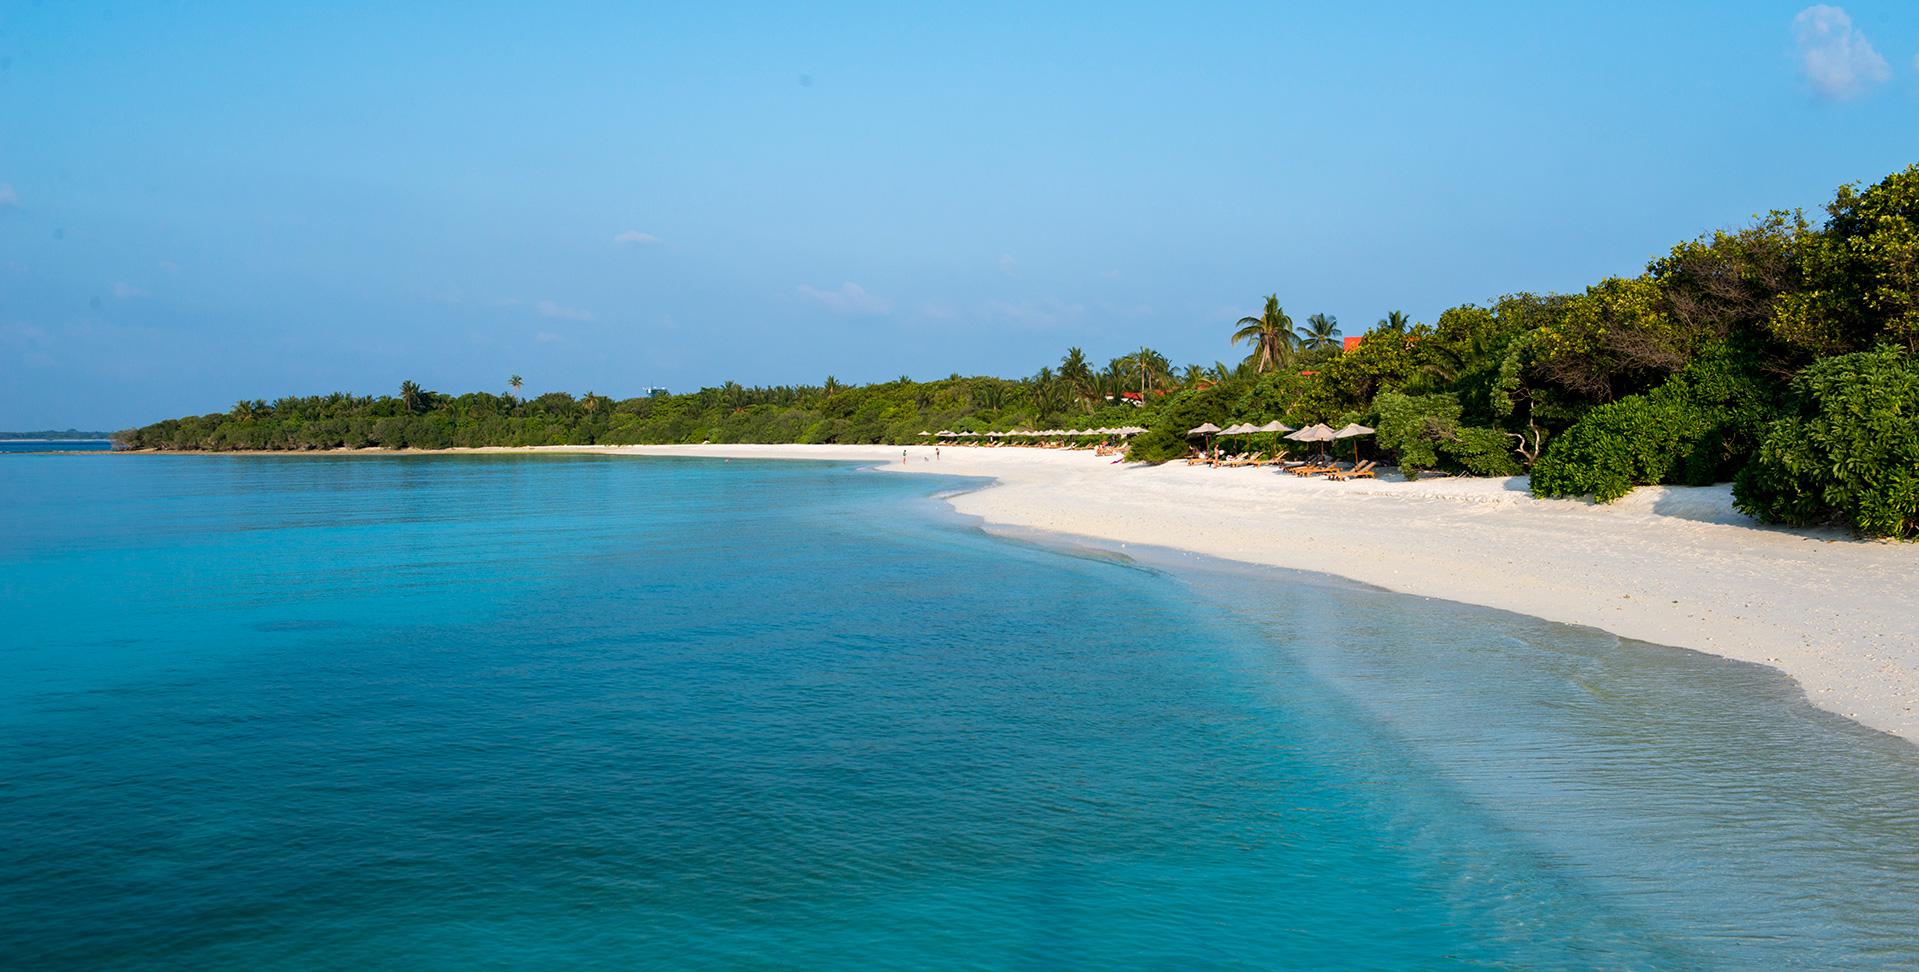 Barefoot_Resort-Maldive-Spiaggia-Wadi_Destination.jpg